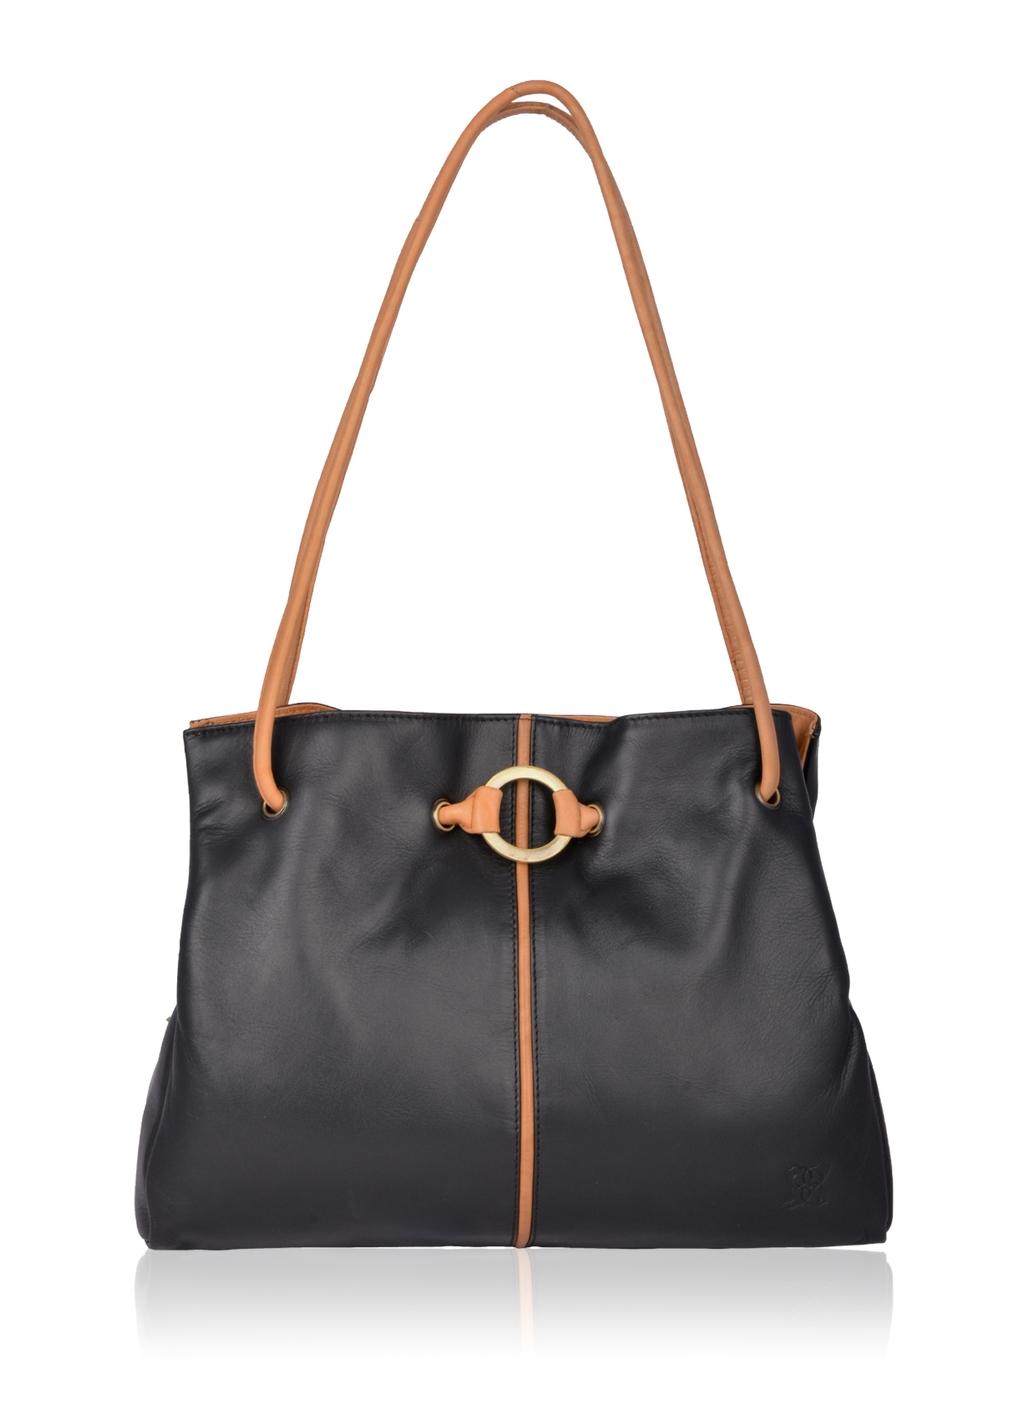 Ring Detail Leather Handbag in Black and Honey